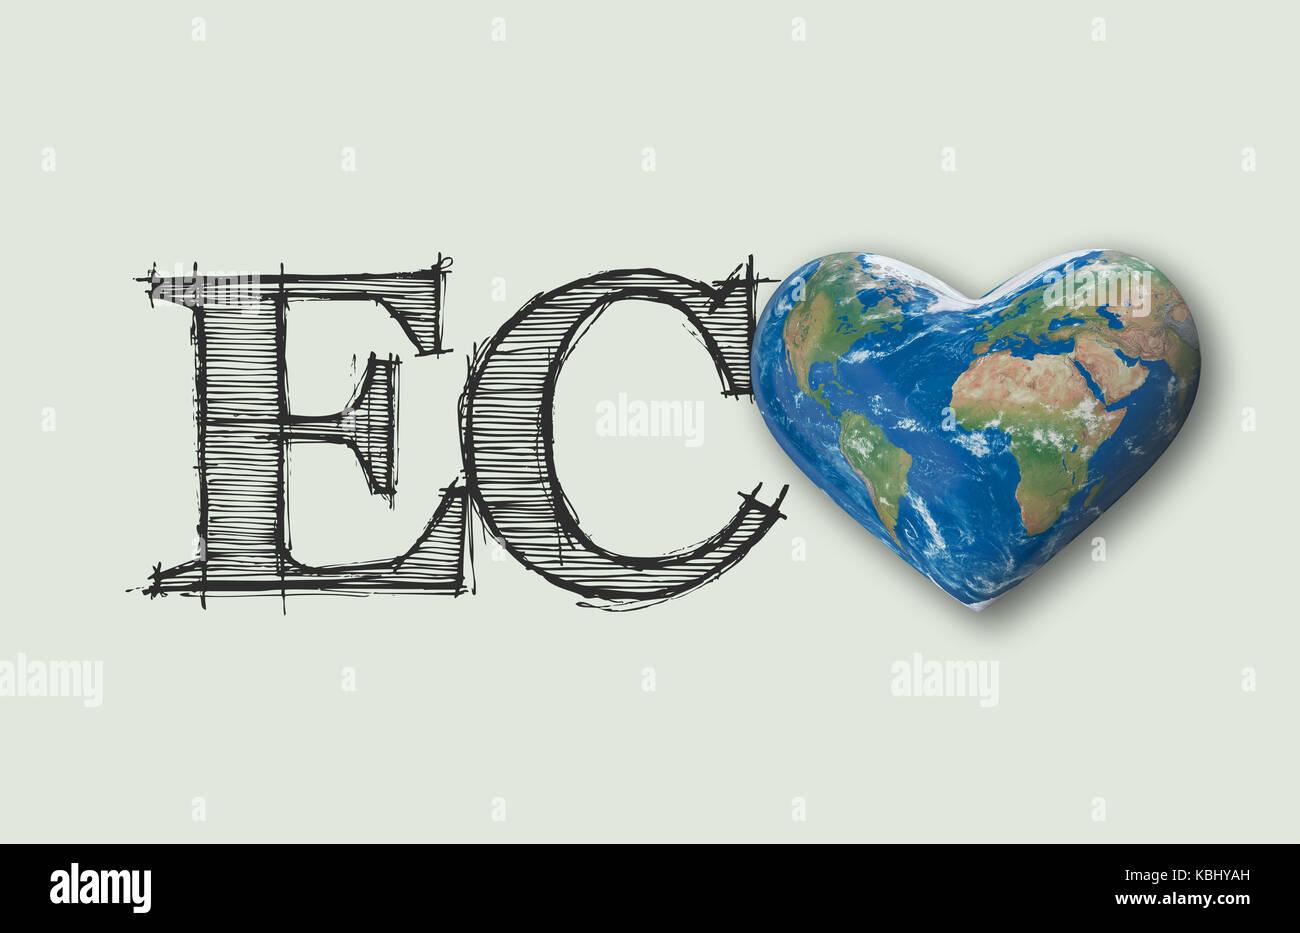 Eco world heart message 3d rendering stock photo royalty free eco world heart message 3d rendering biocorpaavc